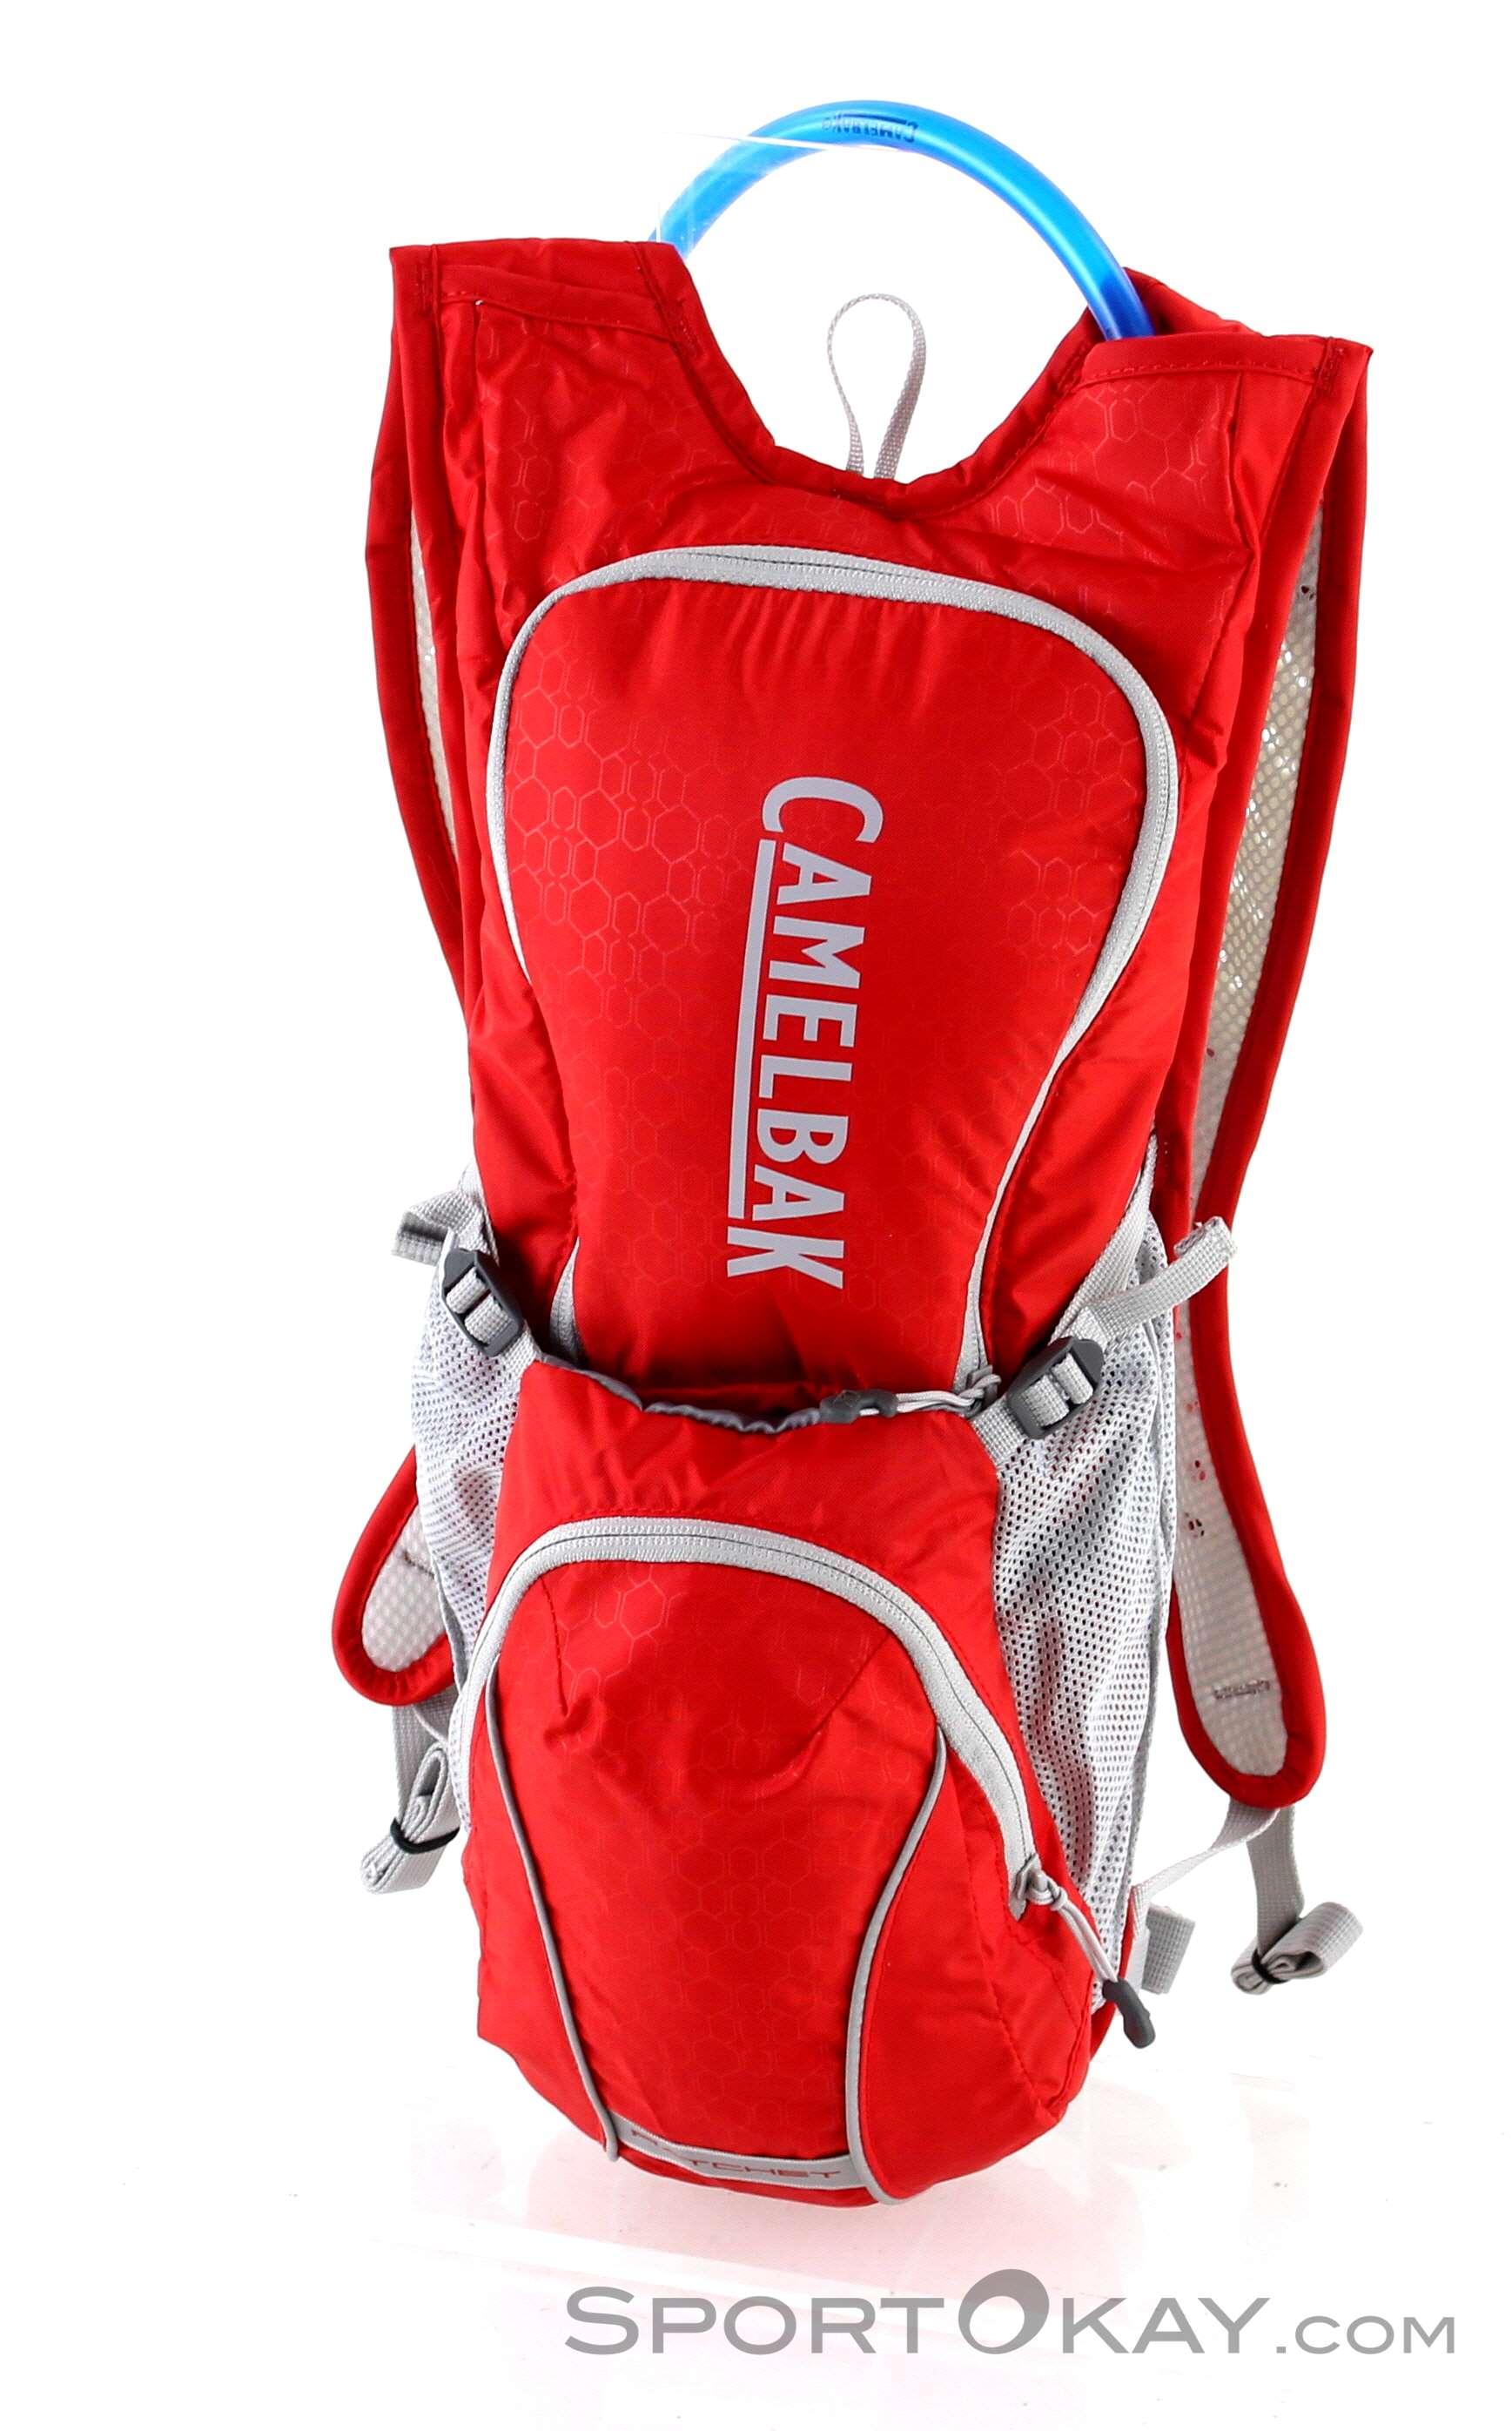 bcdc546e797 Camelbak Ratchet 3+3l Bike Backpack with Hydration System, Camelbak, Red, ,